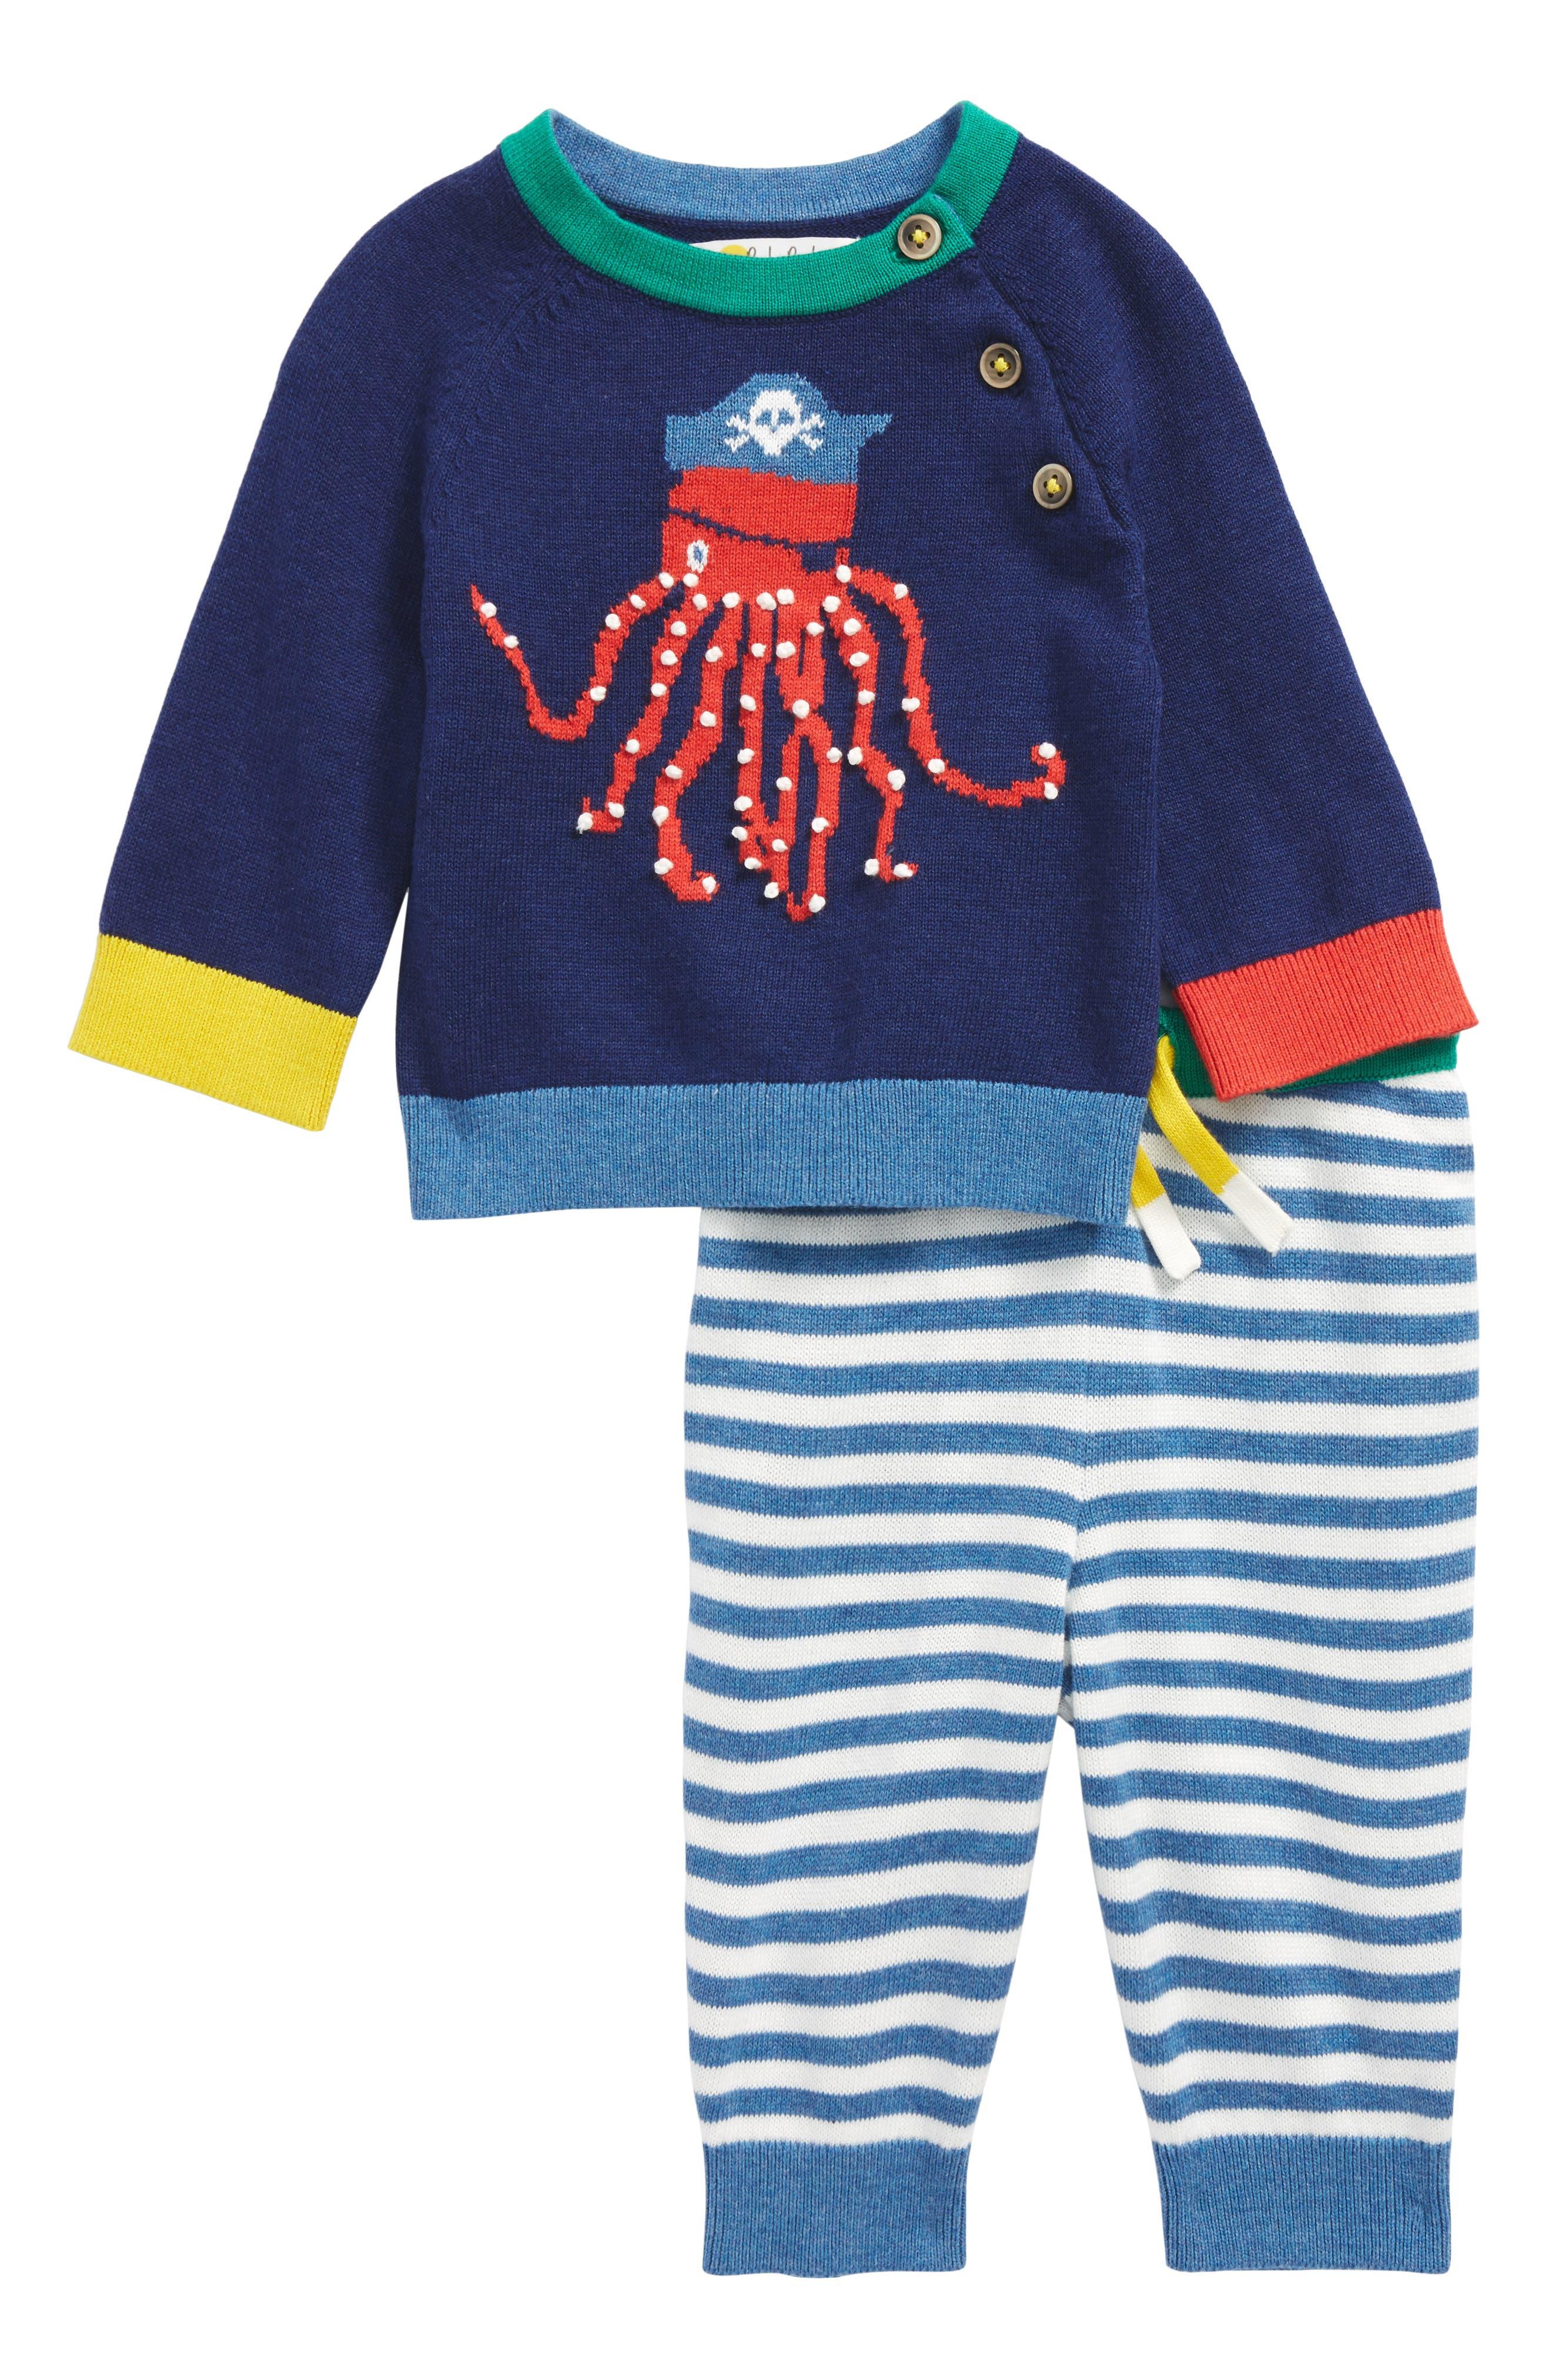 Octopus Sweater & Pants Set,                         Main,                         color, 424